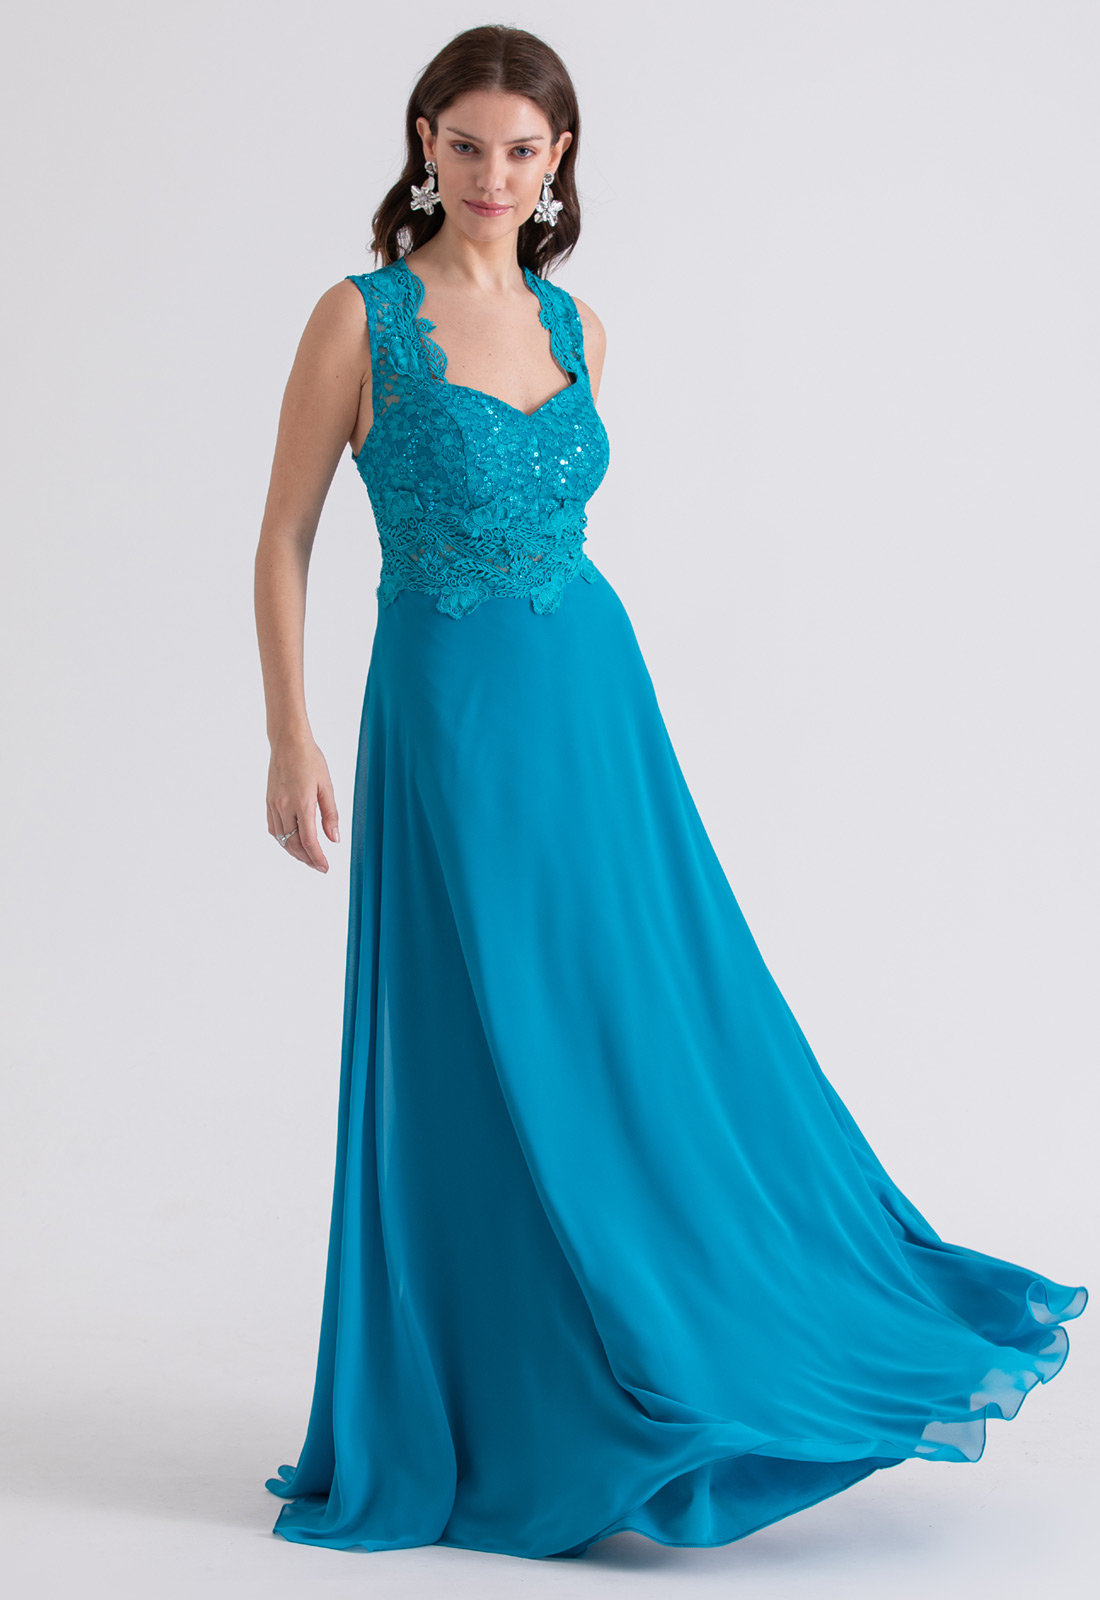 Vestido de festa longo Renda Azul turquesa - Ref. 2223